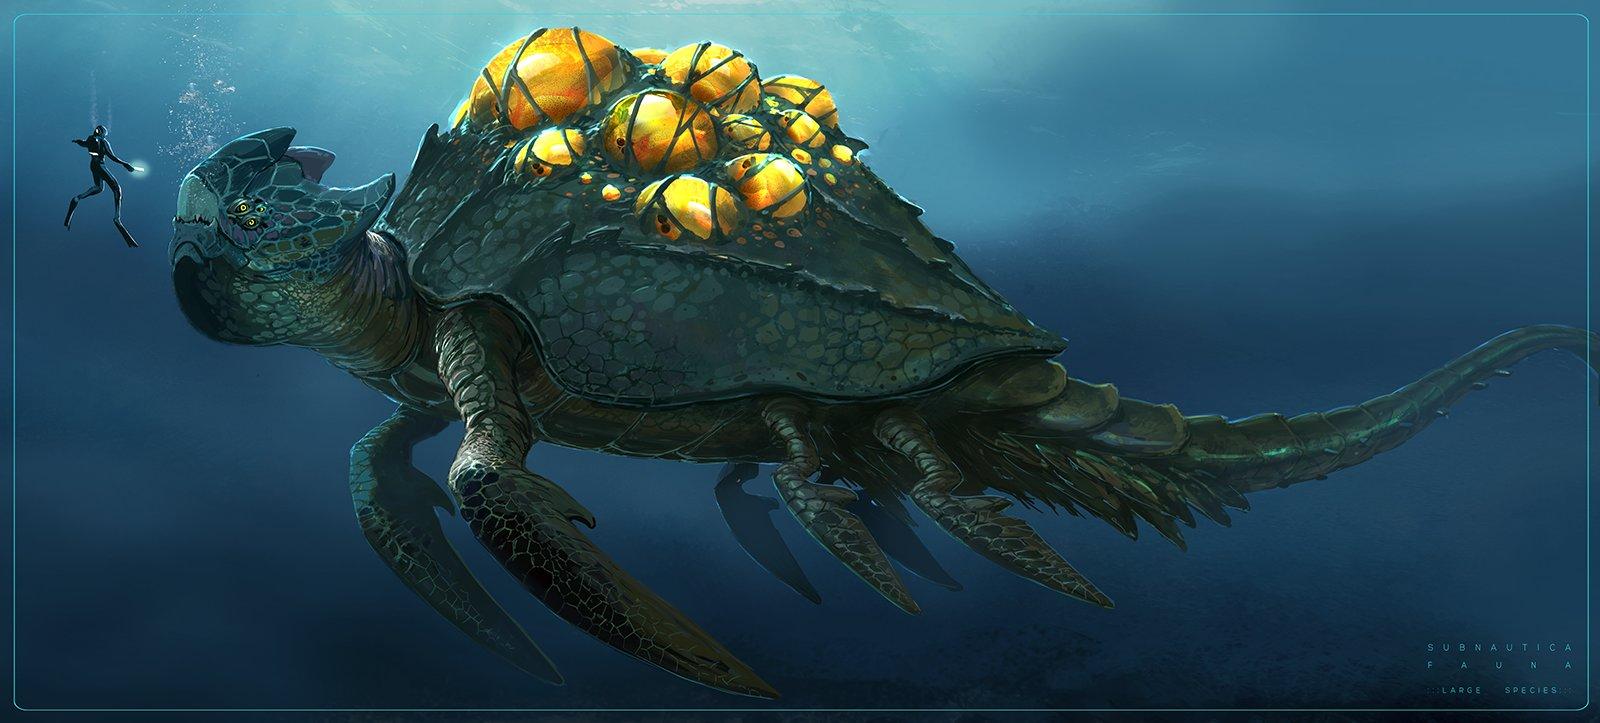 Pat presley deepcreatures turtle